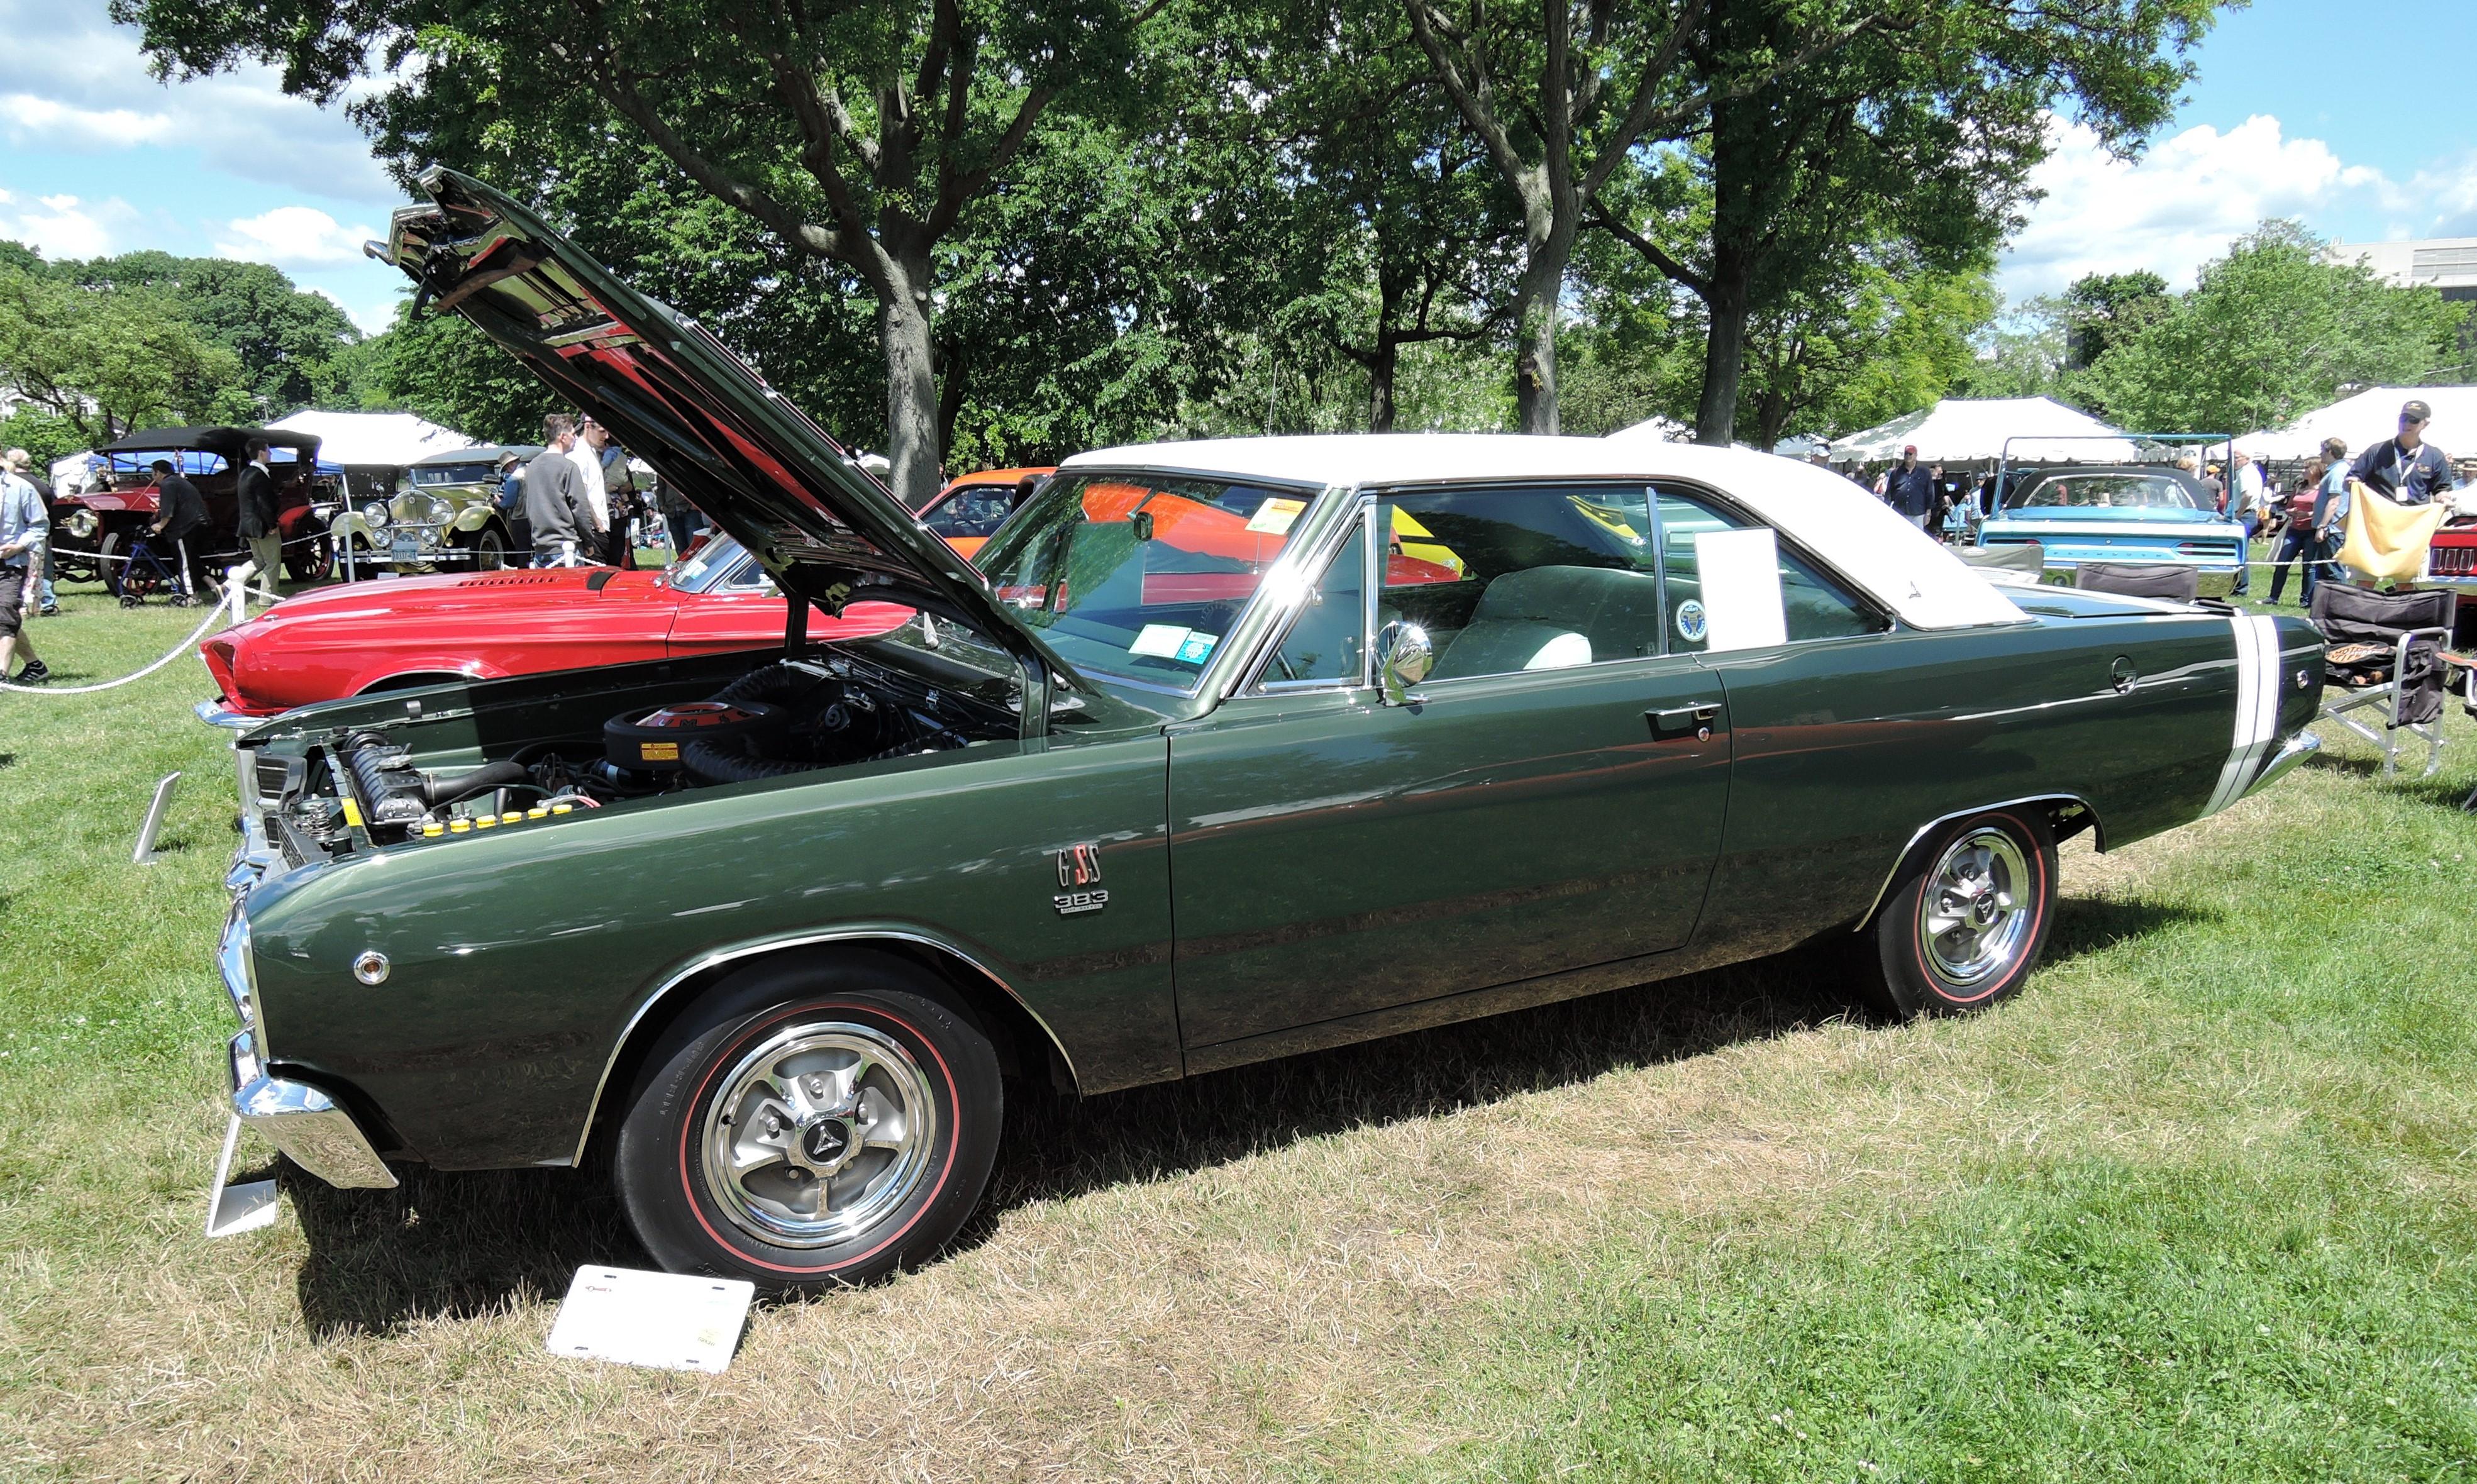 green 1968 Dodge Dart - Greenwich Concours d'Elegance 2017